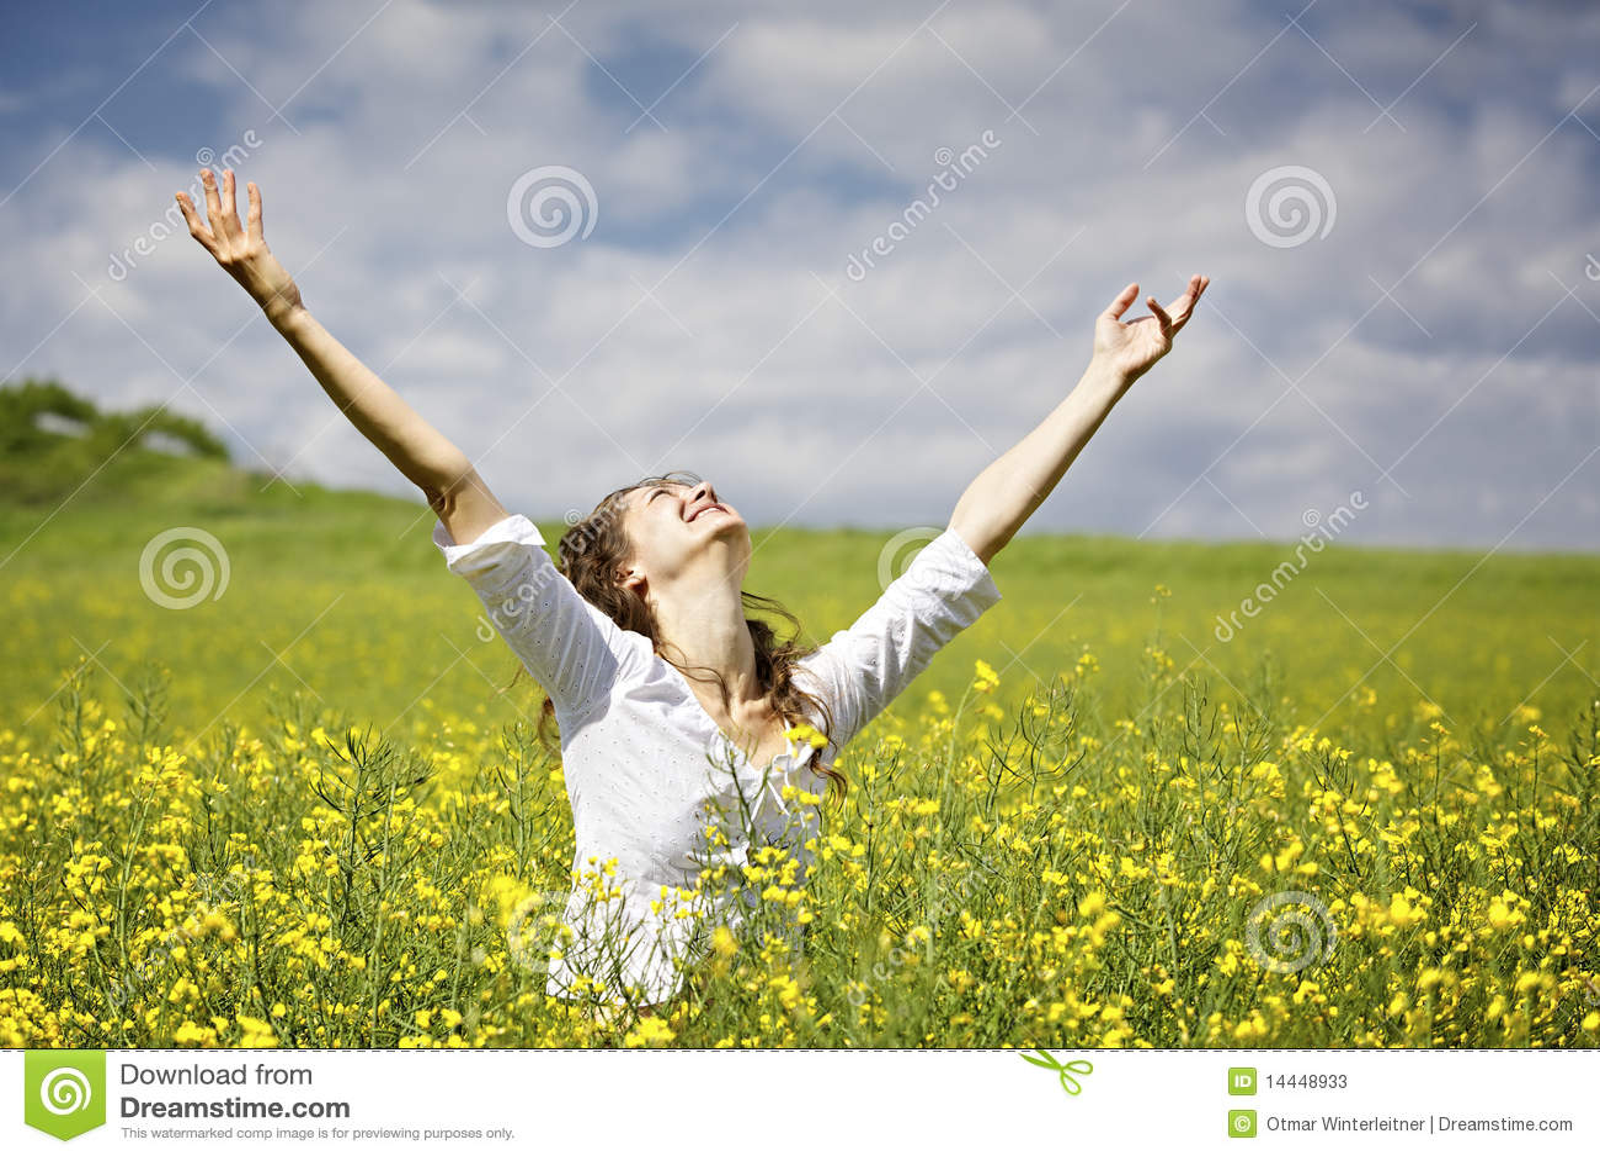 Woman being grateful